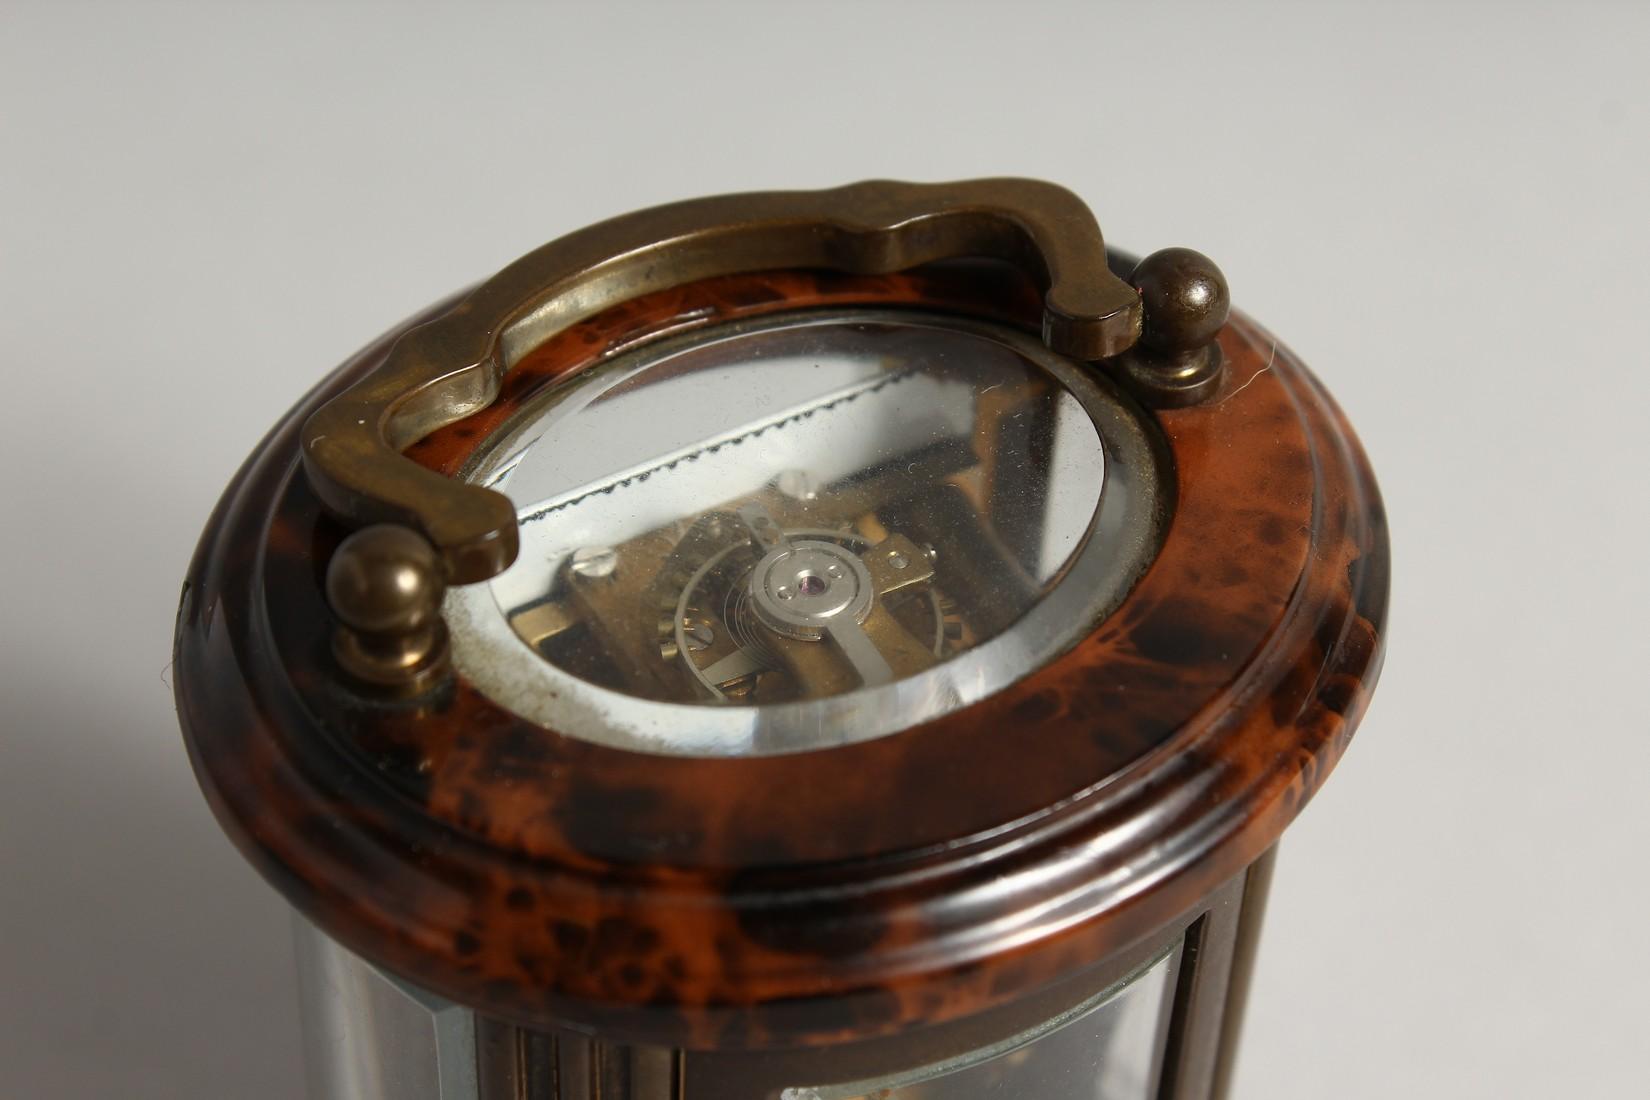 A GOOD CIRCULAR BRASS CARRIAGE CLOCK, MATTHEW NORMAN, LONDON. 3ins high - Image 2 of 7